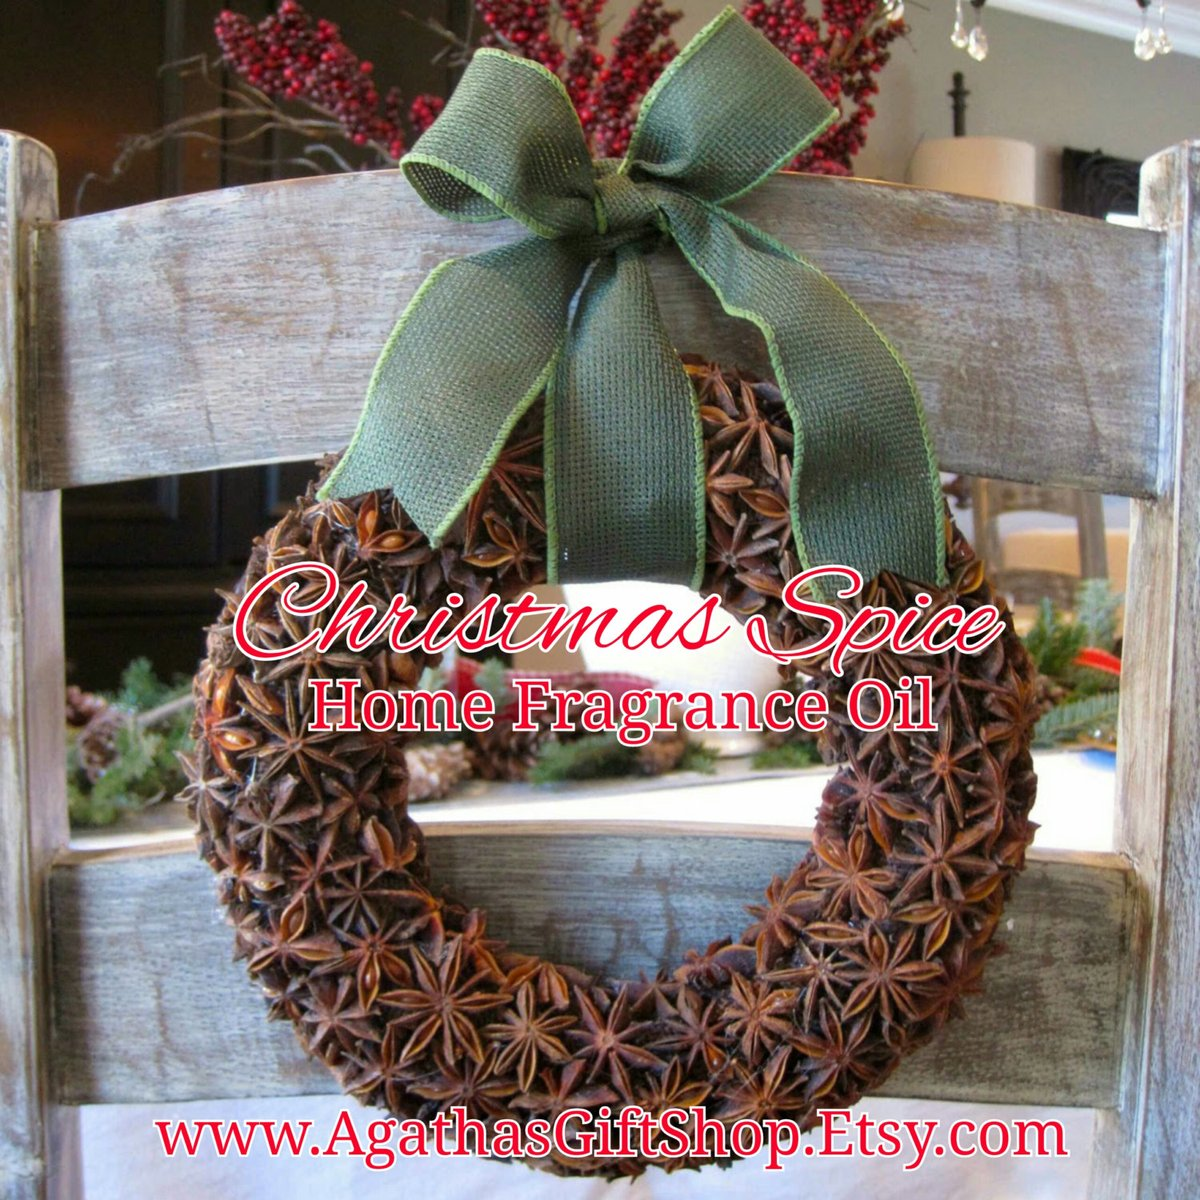 Christmas Spice Home Fragrance Diffuser Warmer Aromatherapy Burning Oil  #Incense #BlackFriday #HomeFragranceOil #AromatherapyOil #CyberMonday #PerfumeBodyOils #GiftShopSale #Wedding #HerbalRemedies #Etsy #HomeDecor